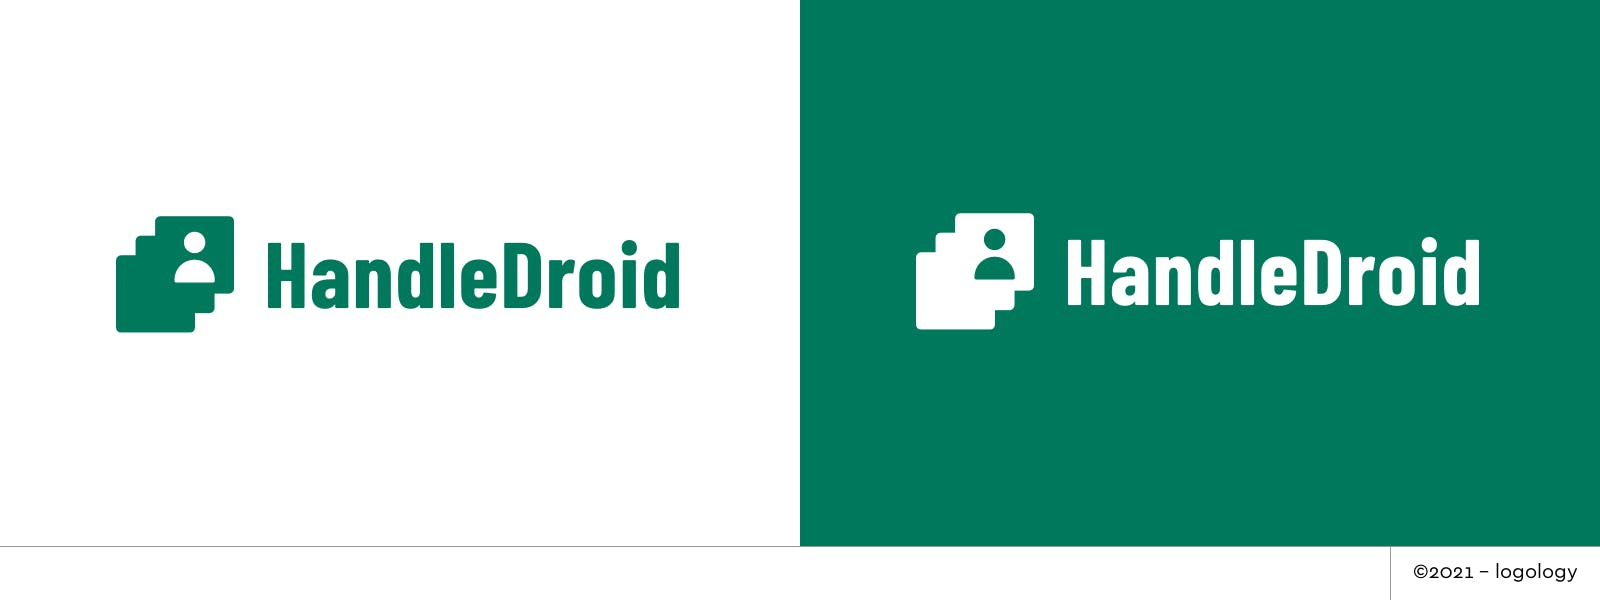 handledroid logo metled cards